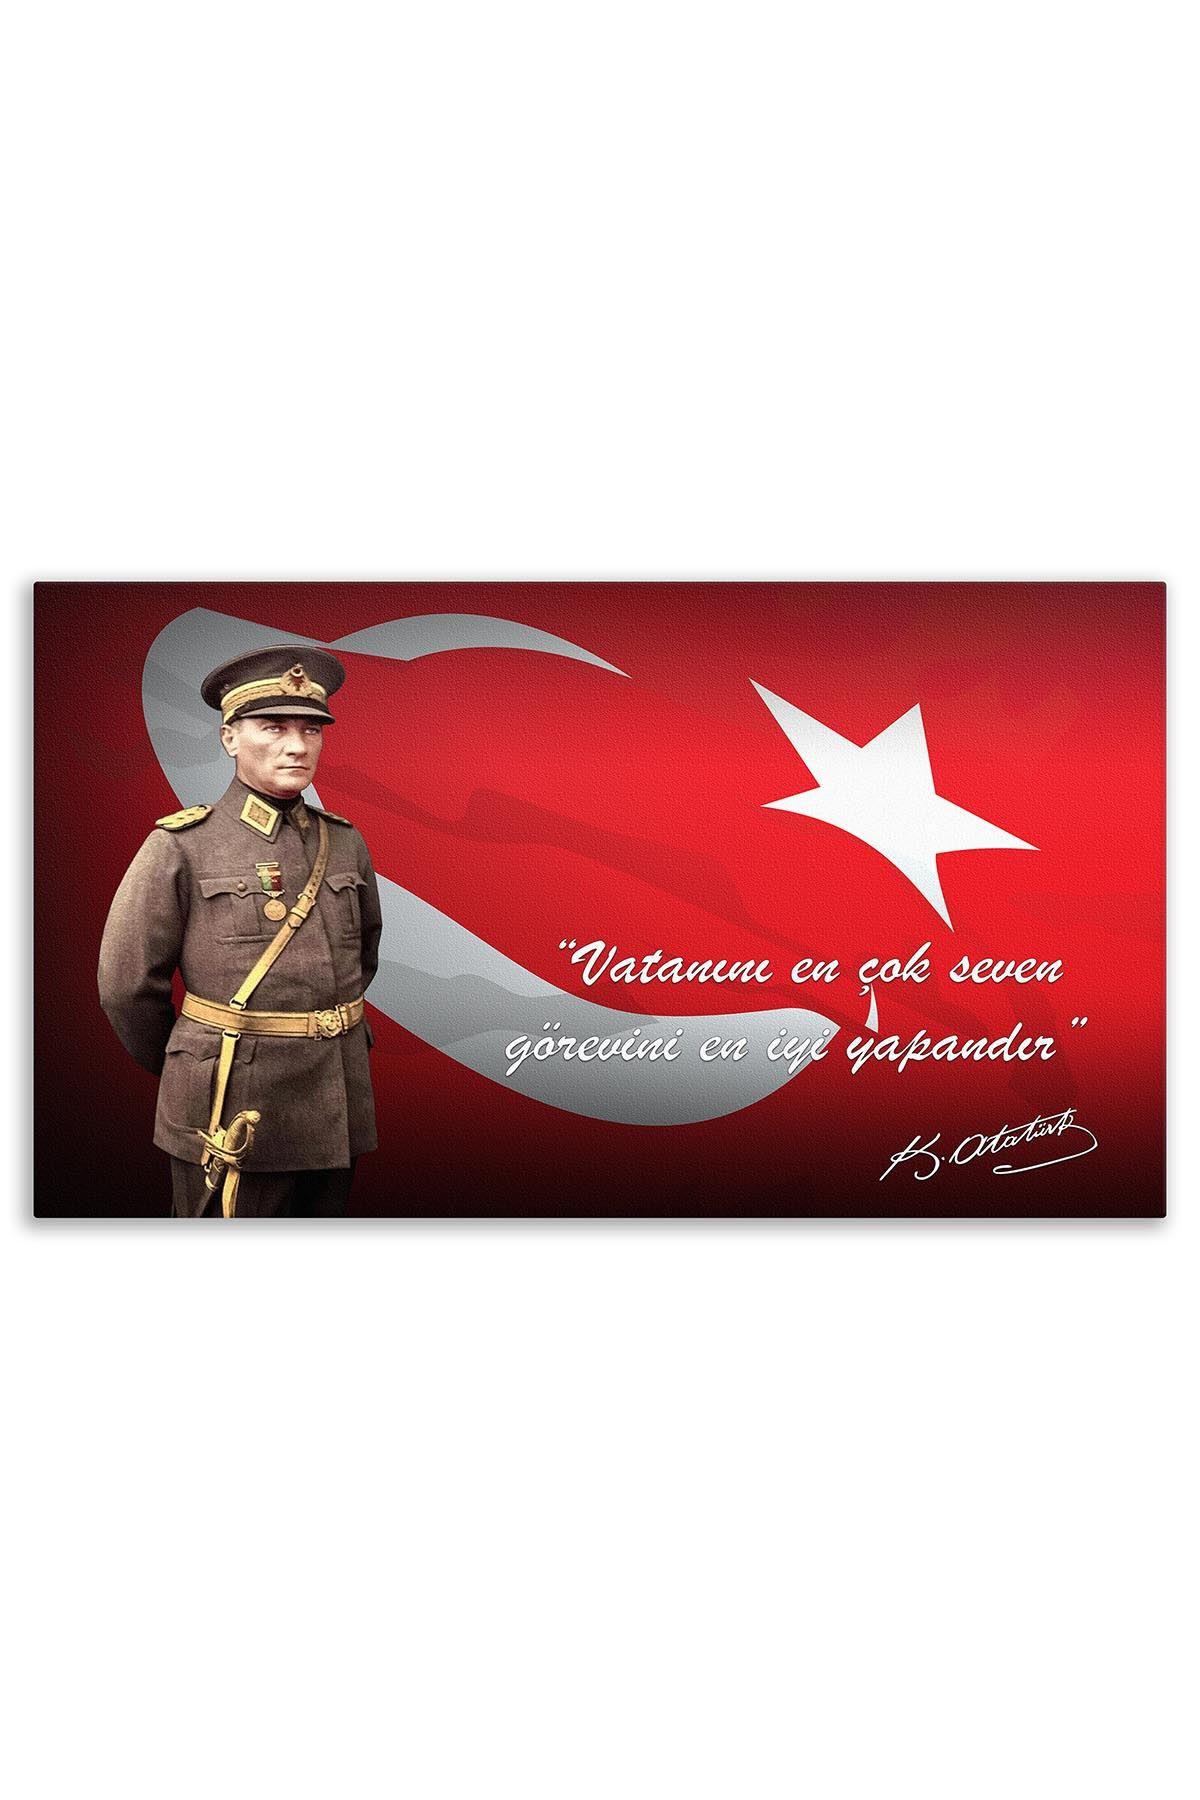 Atatürk With Turkish Flag Canvas Board | Printed Canvas Board | Customized Canvas Board | Digital Printing